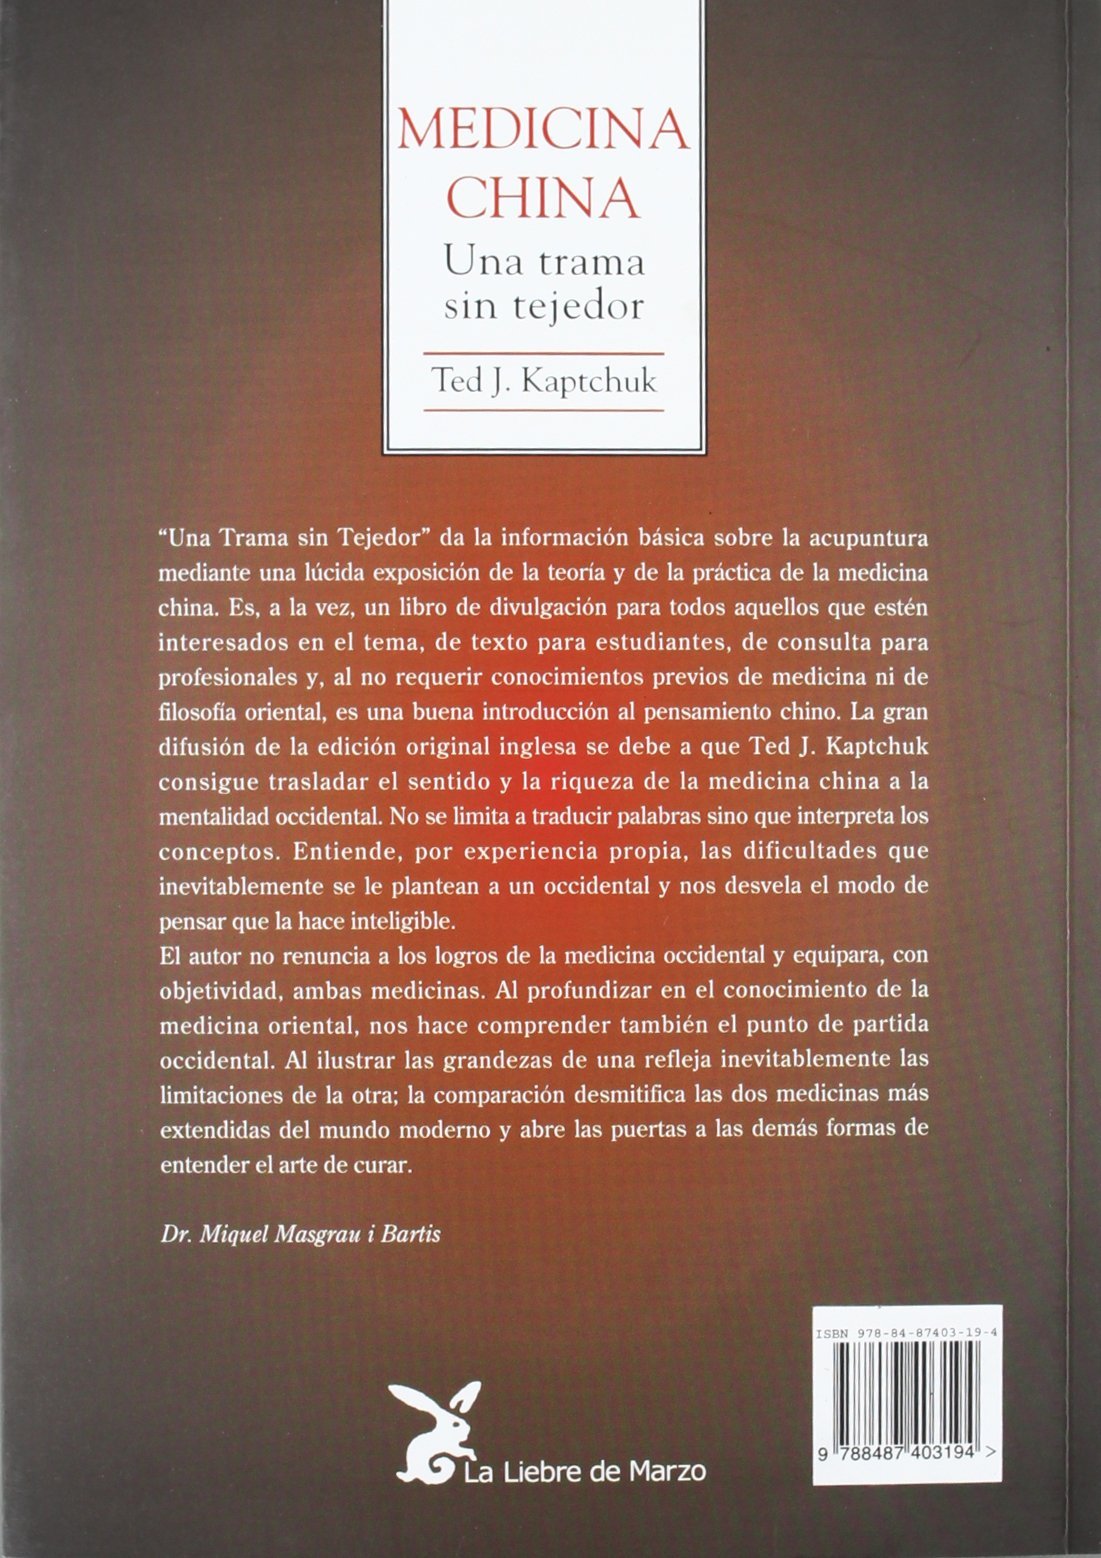 Amazon.com: Medicina China: Una Trama Sin Tejedor (Spanish Edition ...